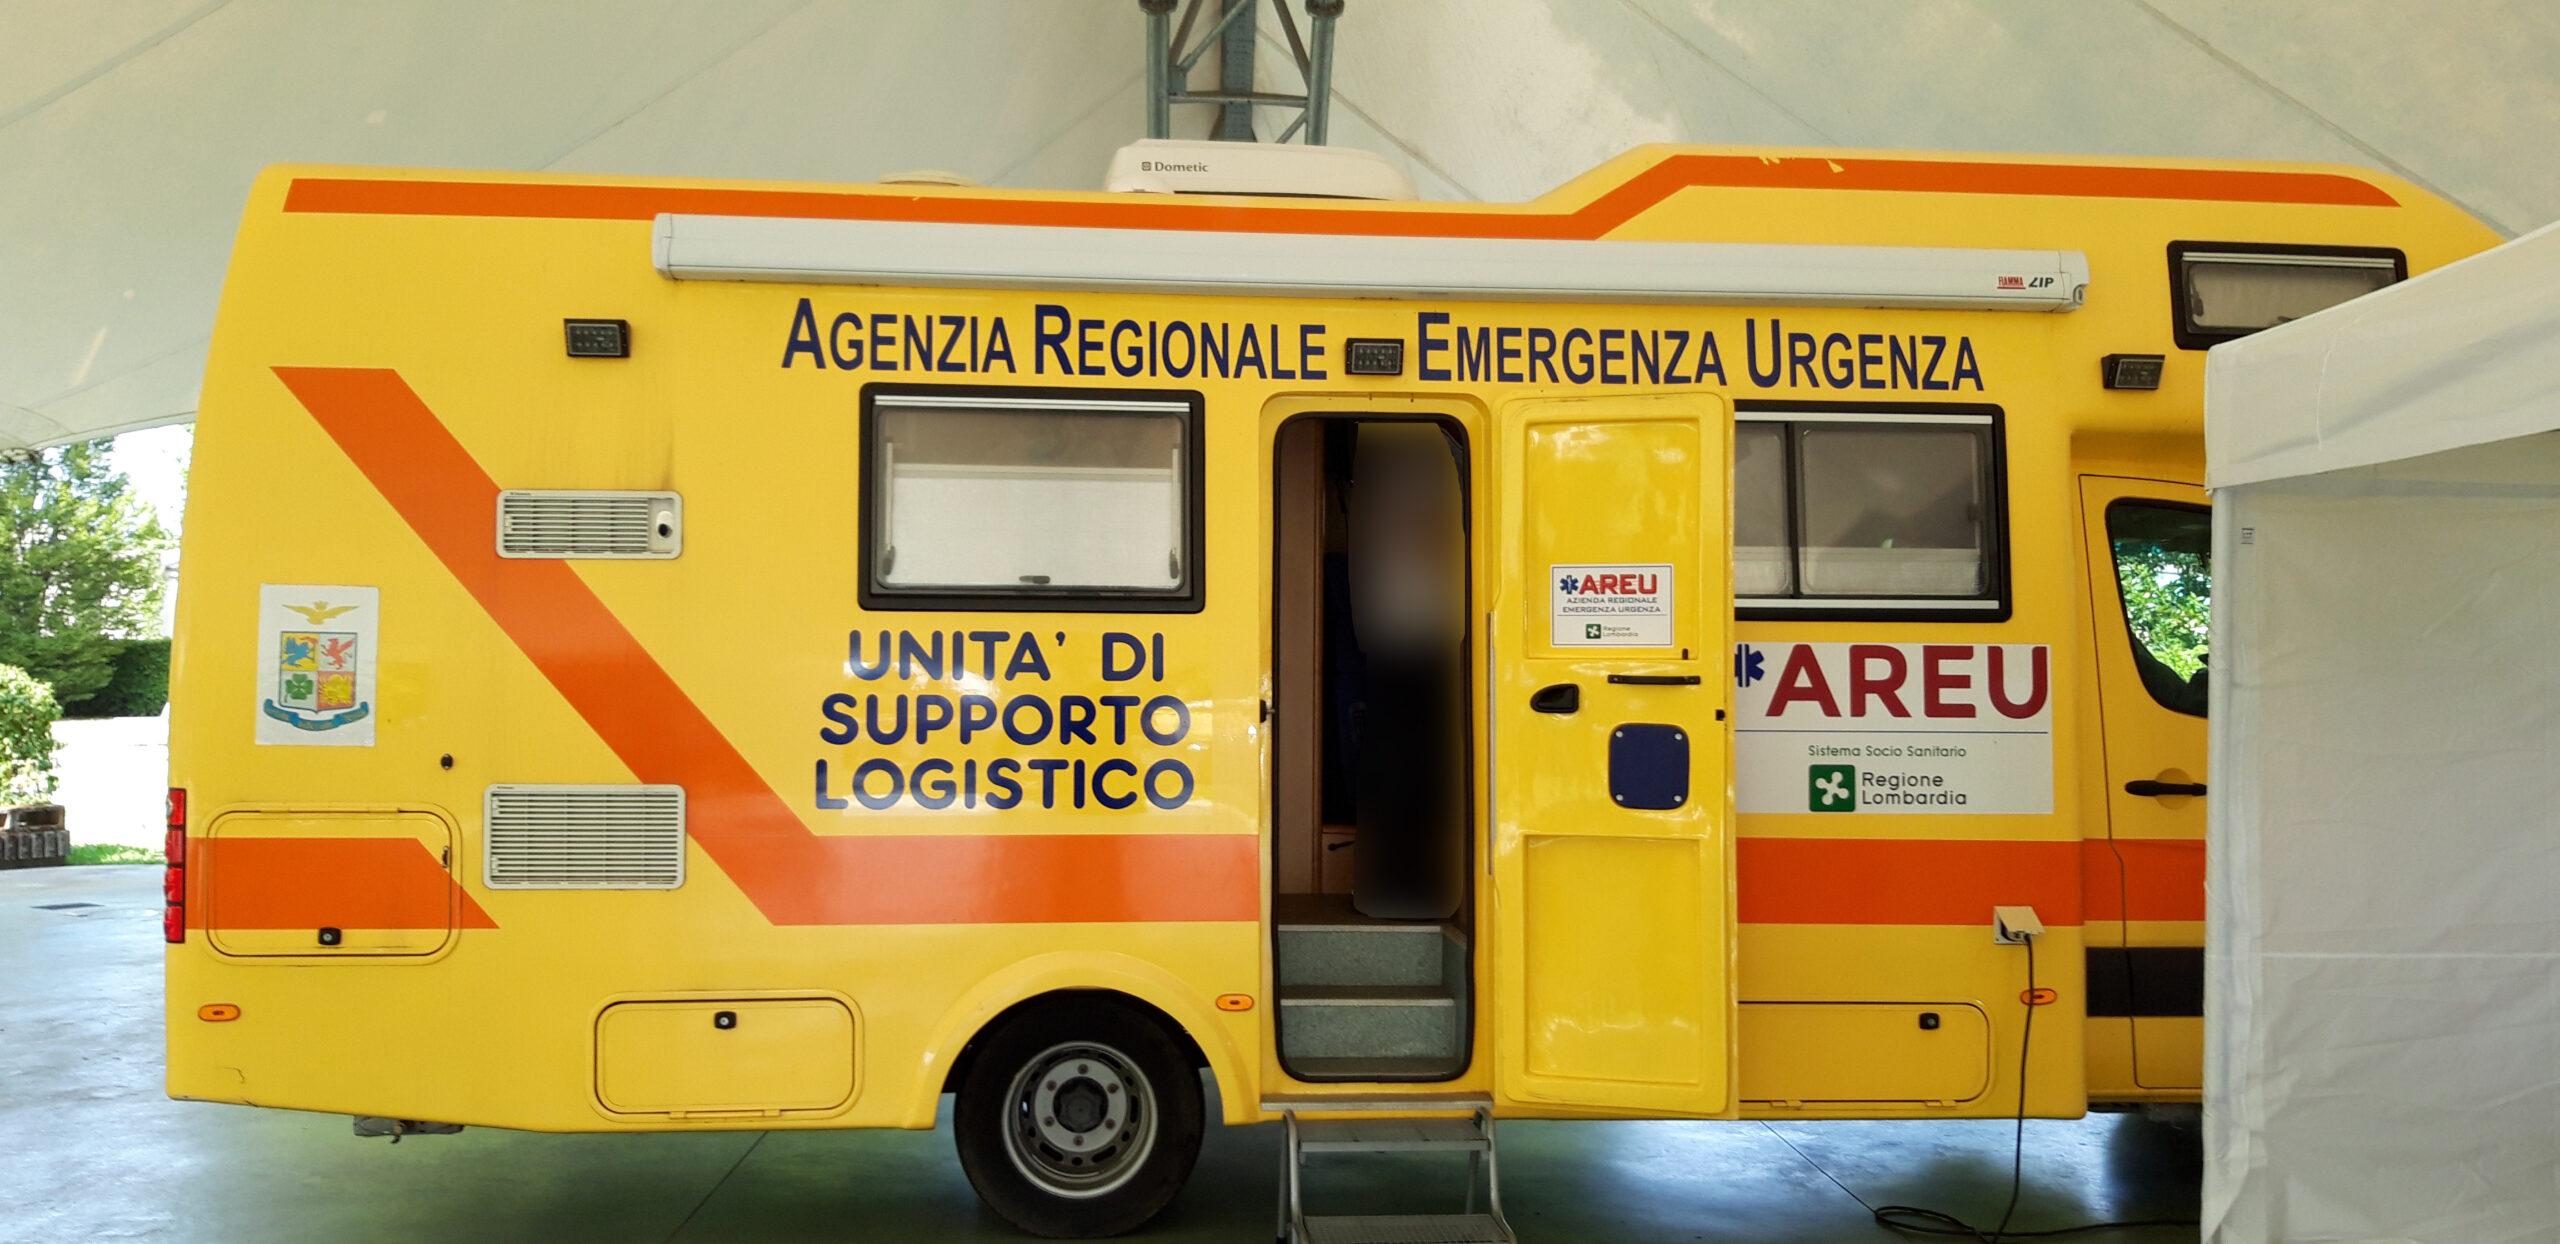 unità vaccinale mobile areu (2)